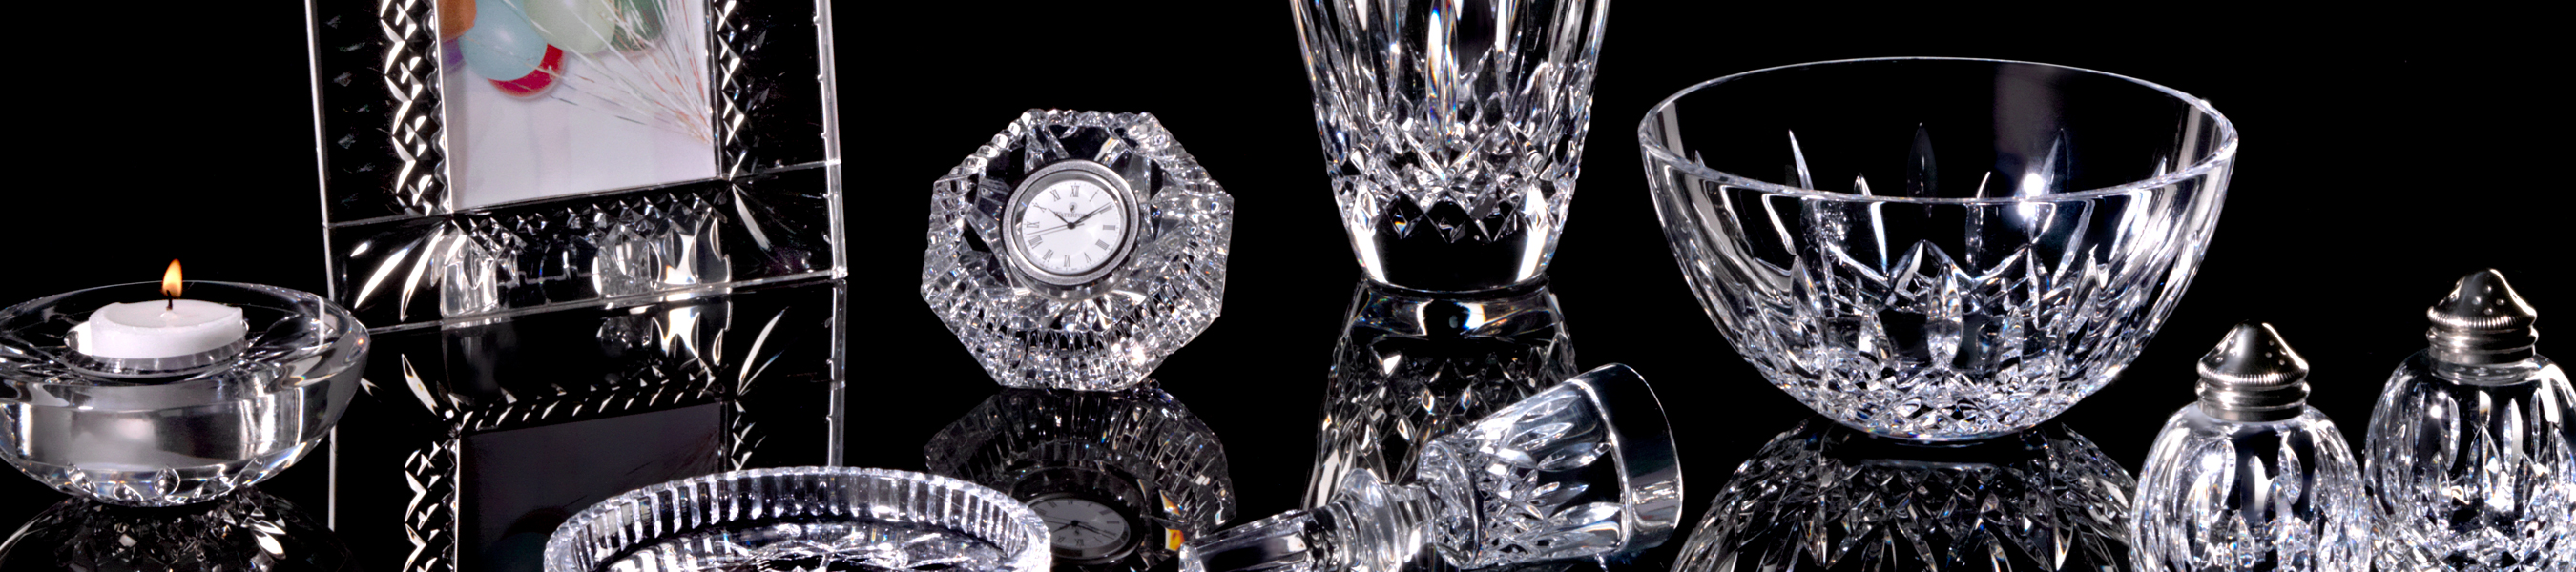 waterford-giftware-glam.jpg